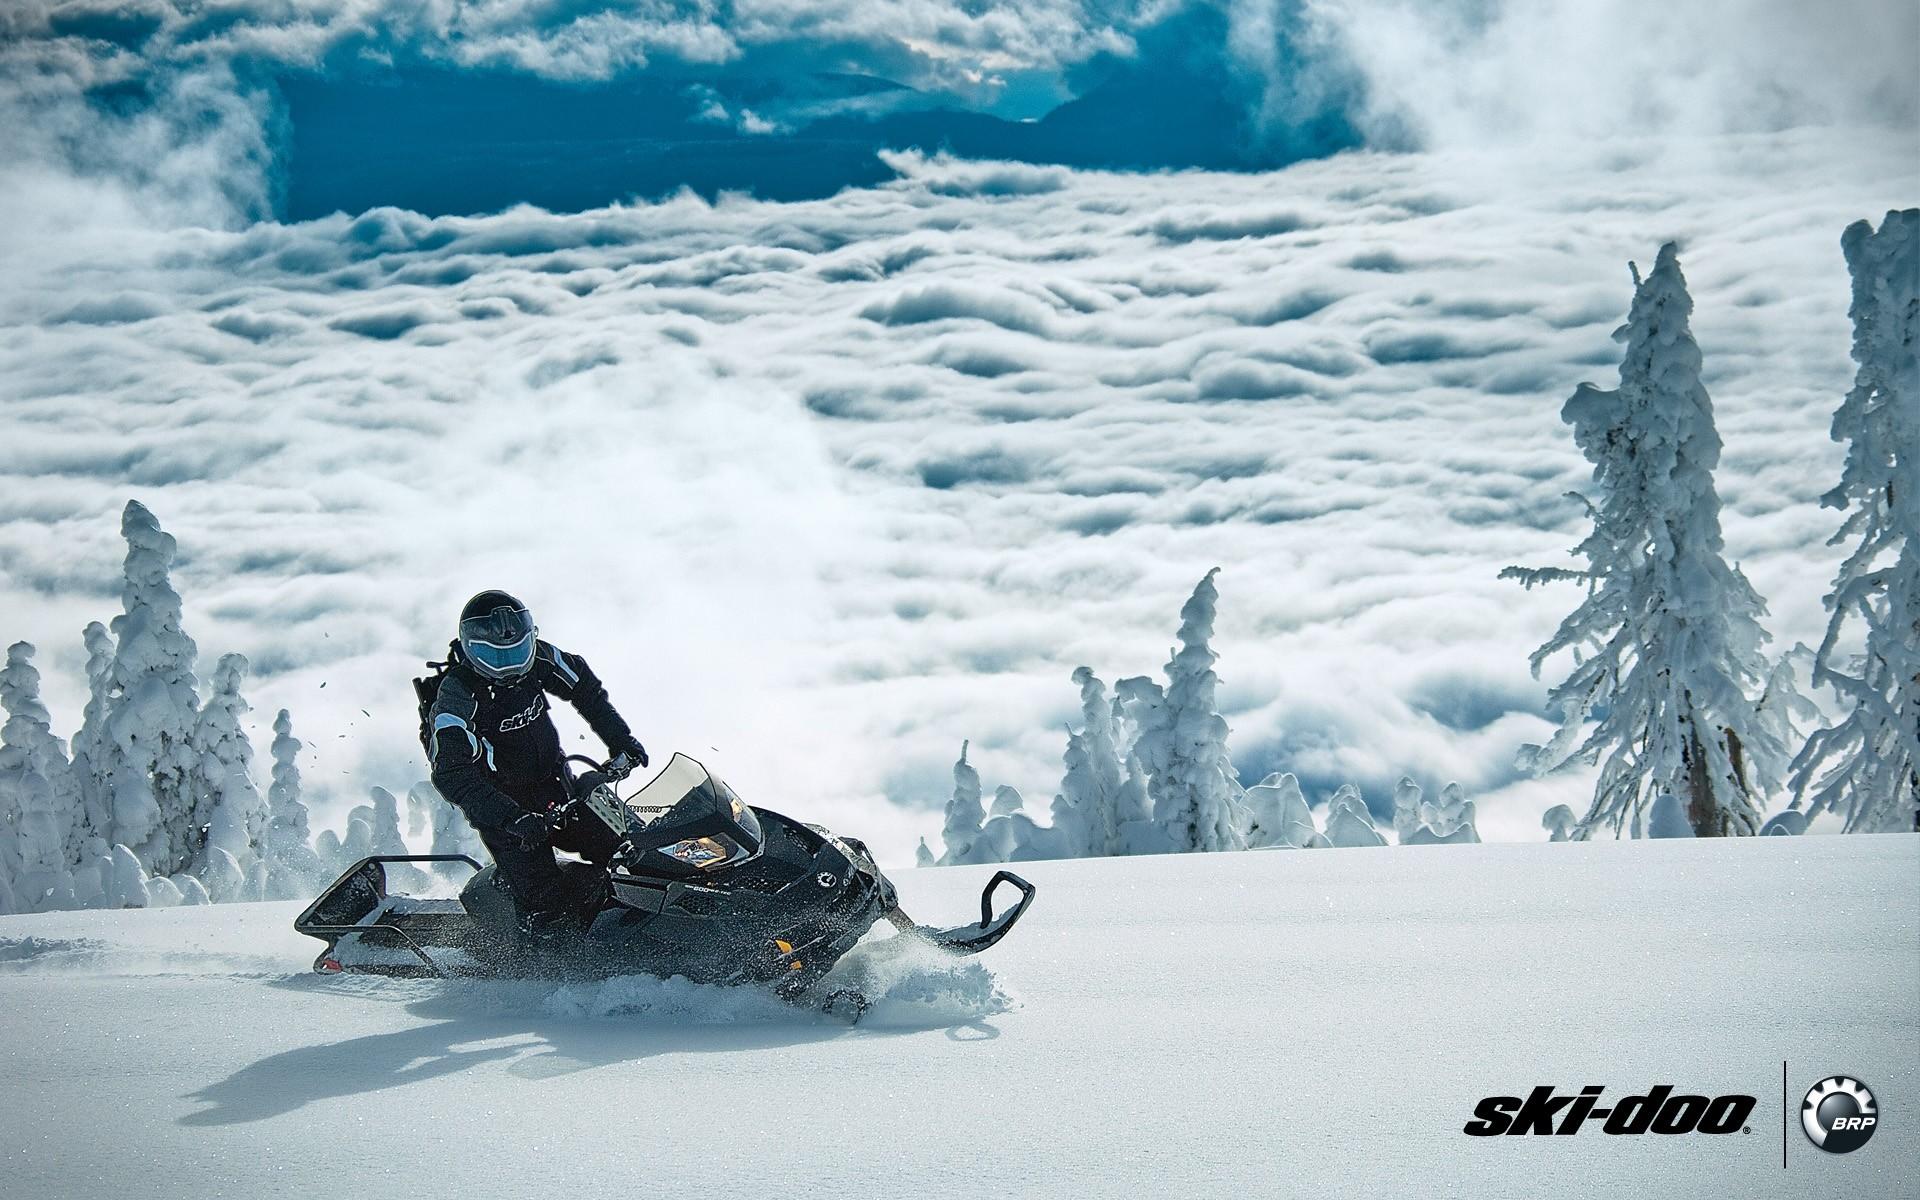 Xtreme Ski Doo Tundra Desktop Wallpaper Winter Sport